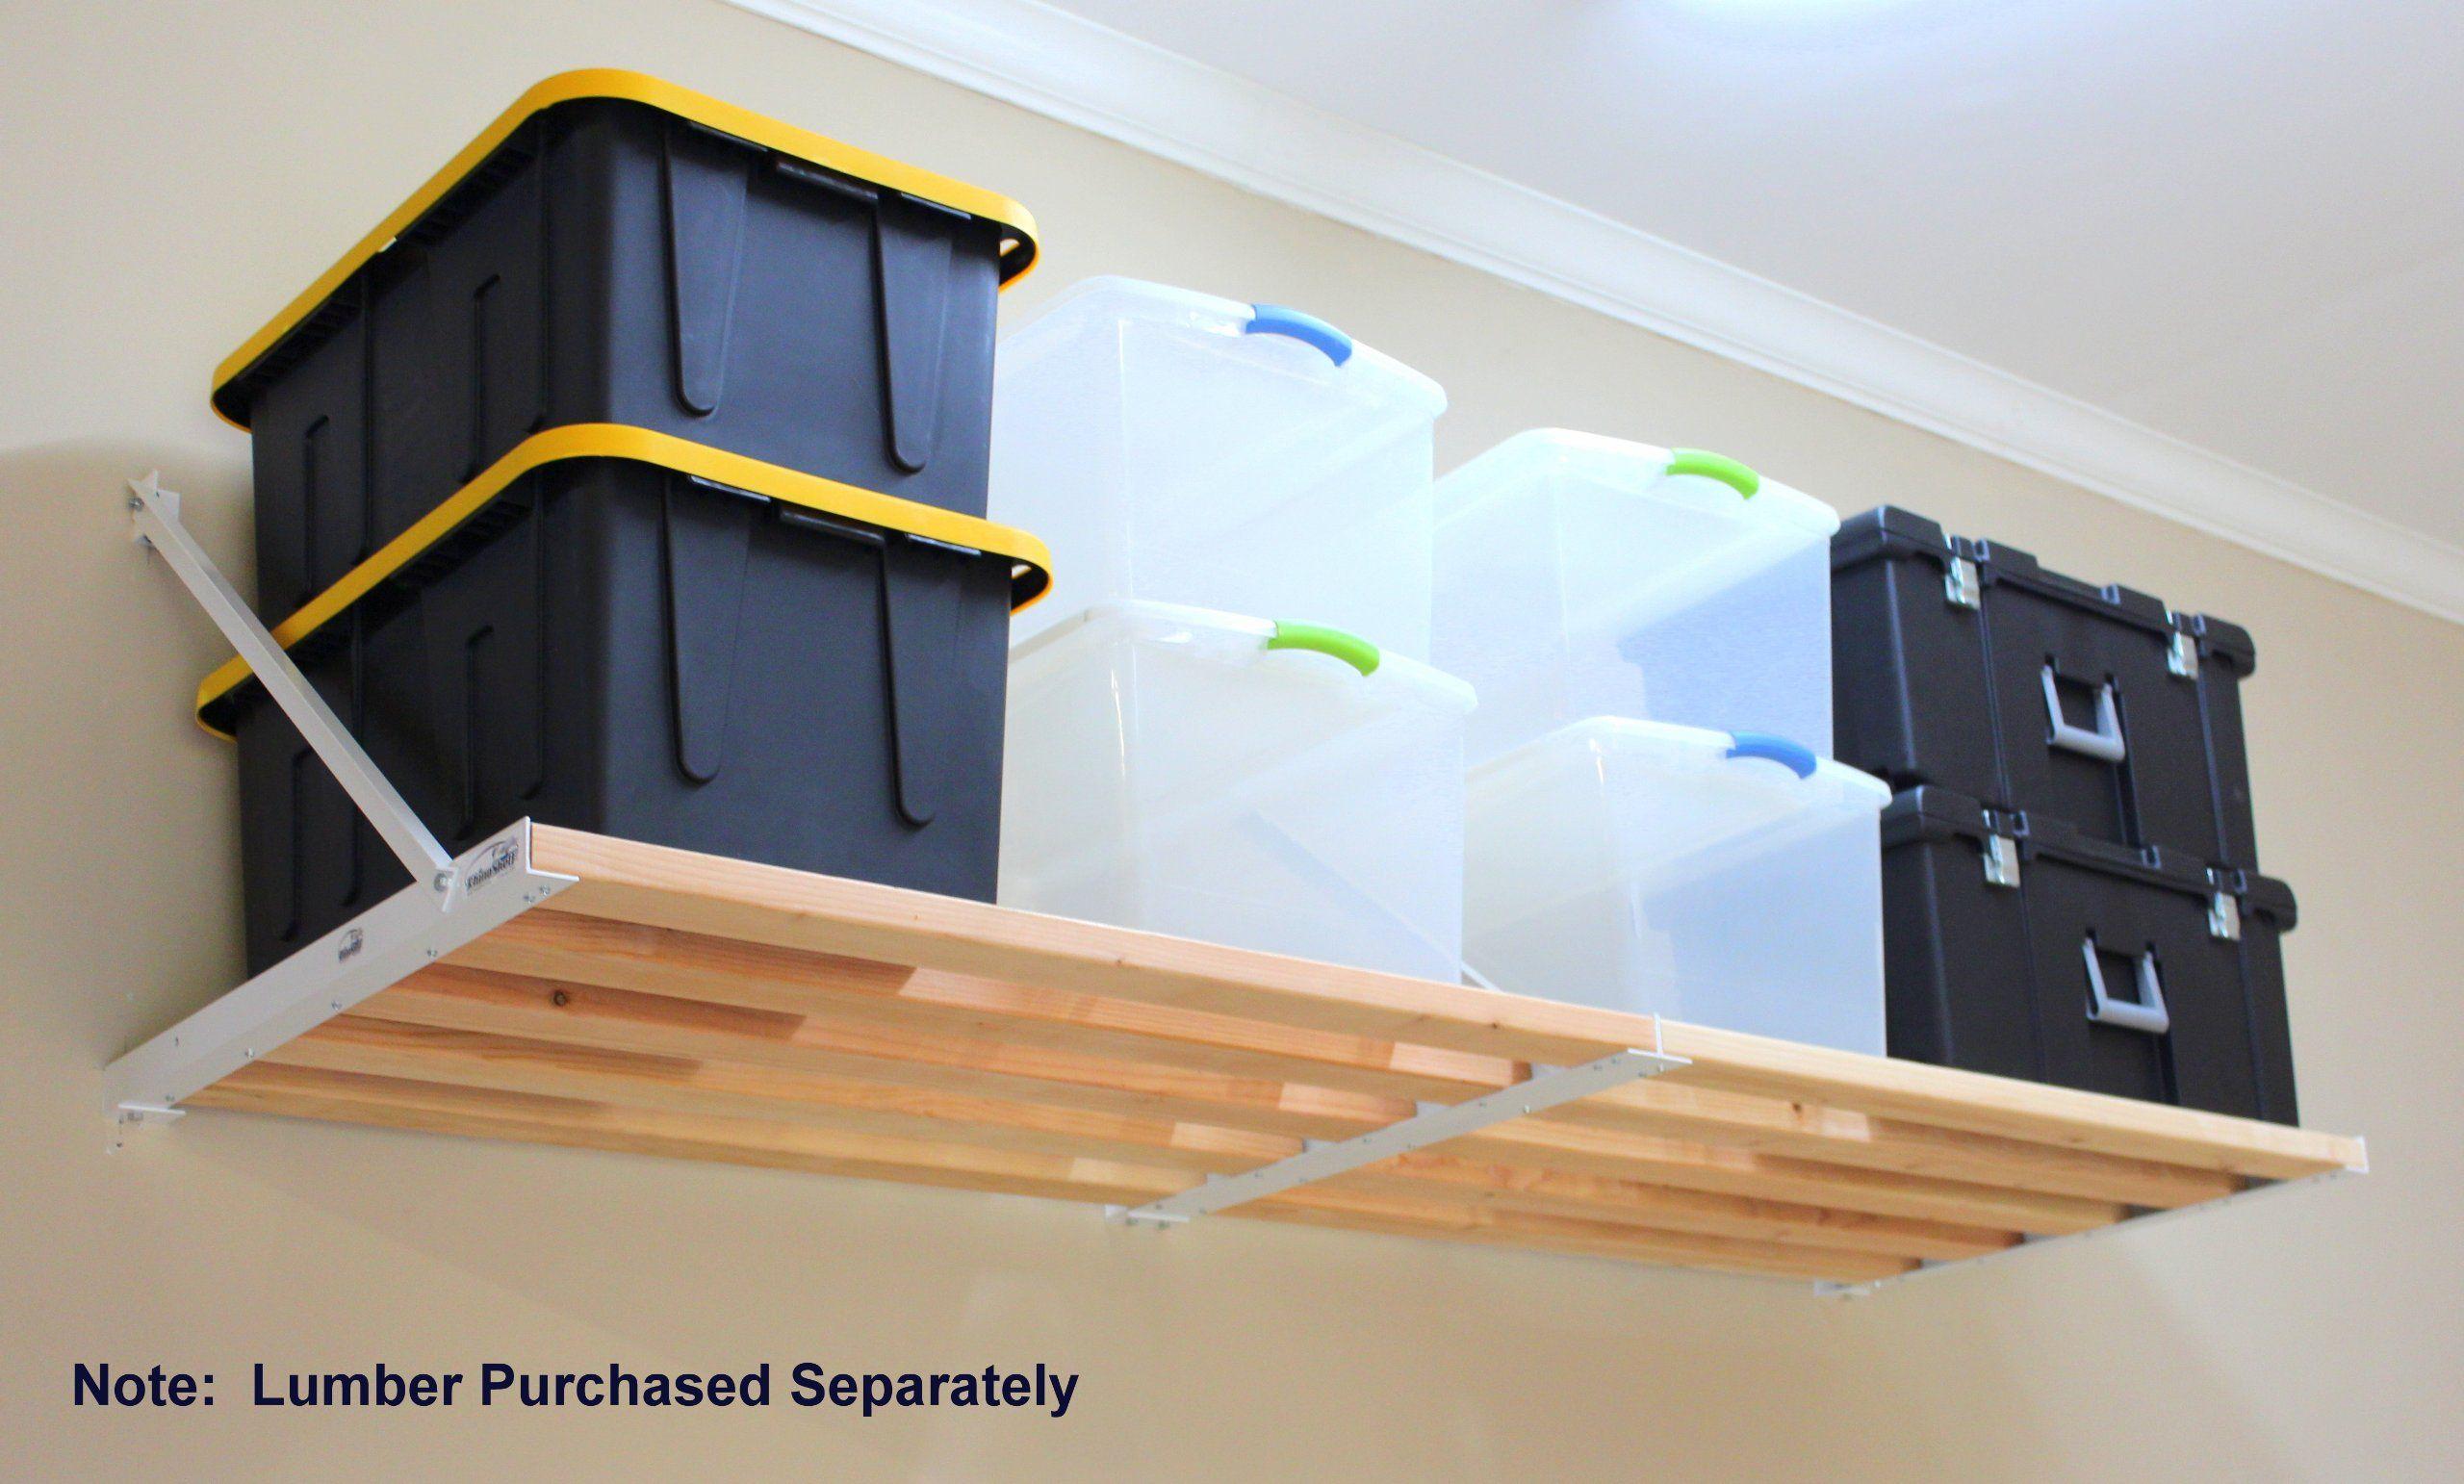 DIY Rhino Shelf Garage Shelves (8 Foot Length) - Full 33.5